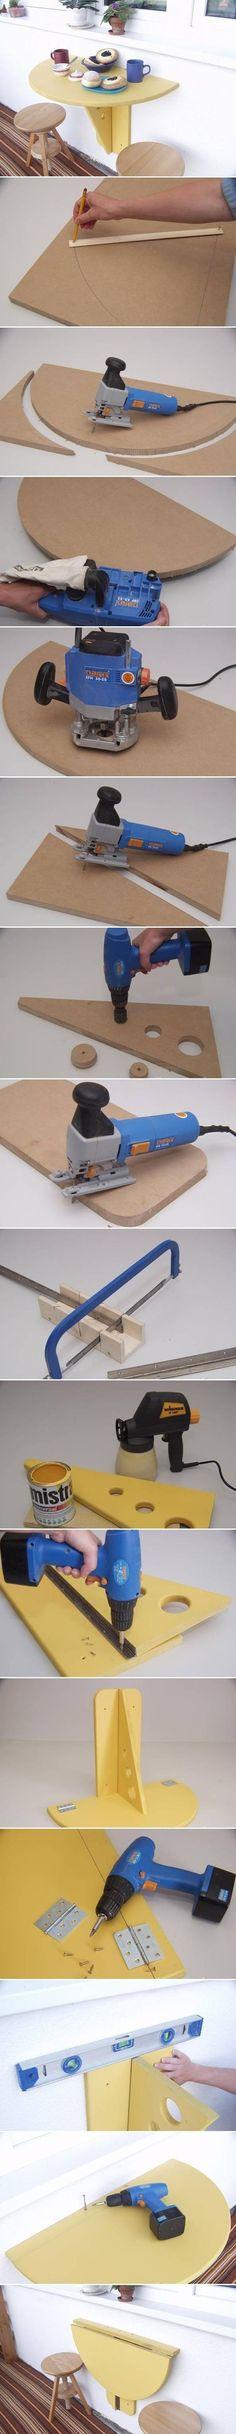 DIY Balcony Folding Table: